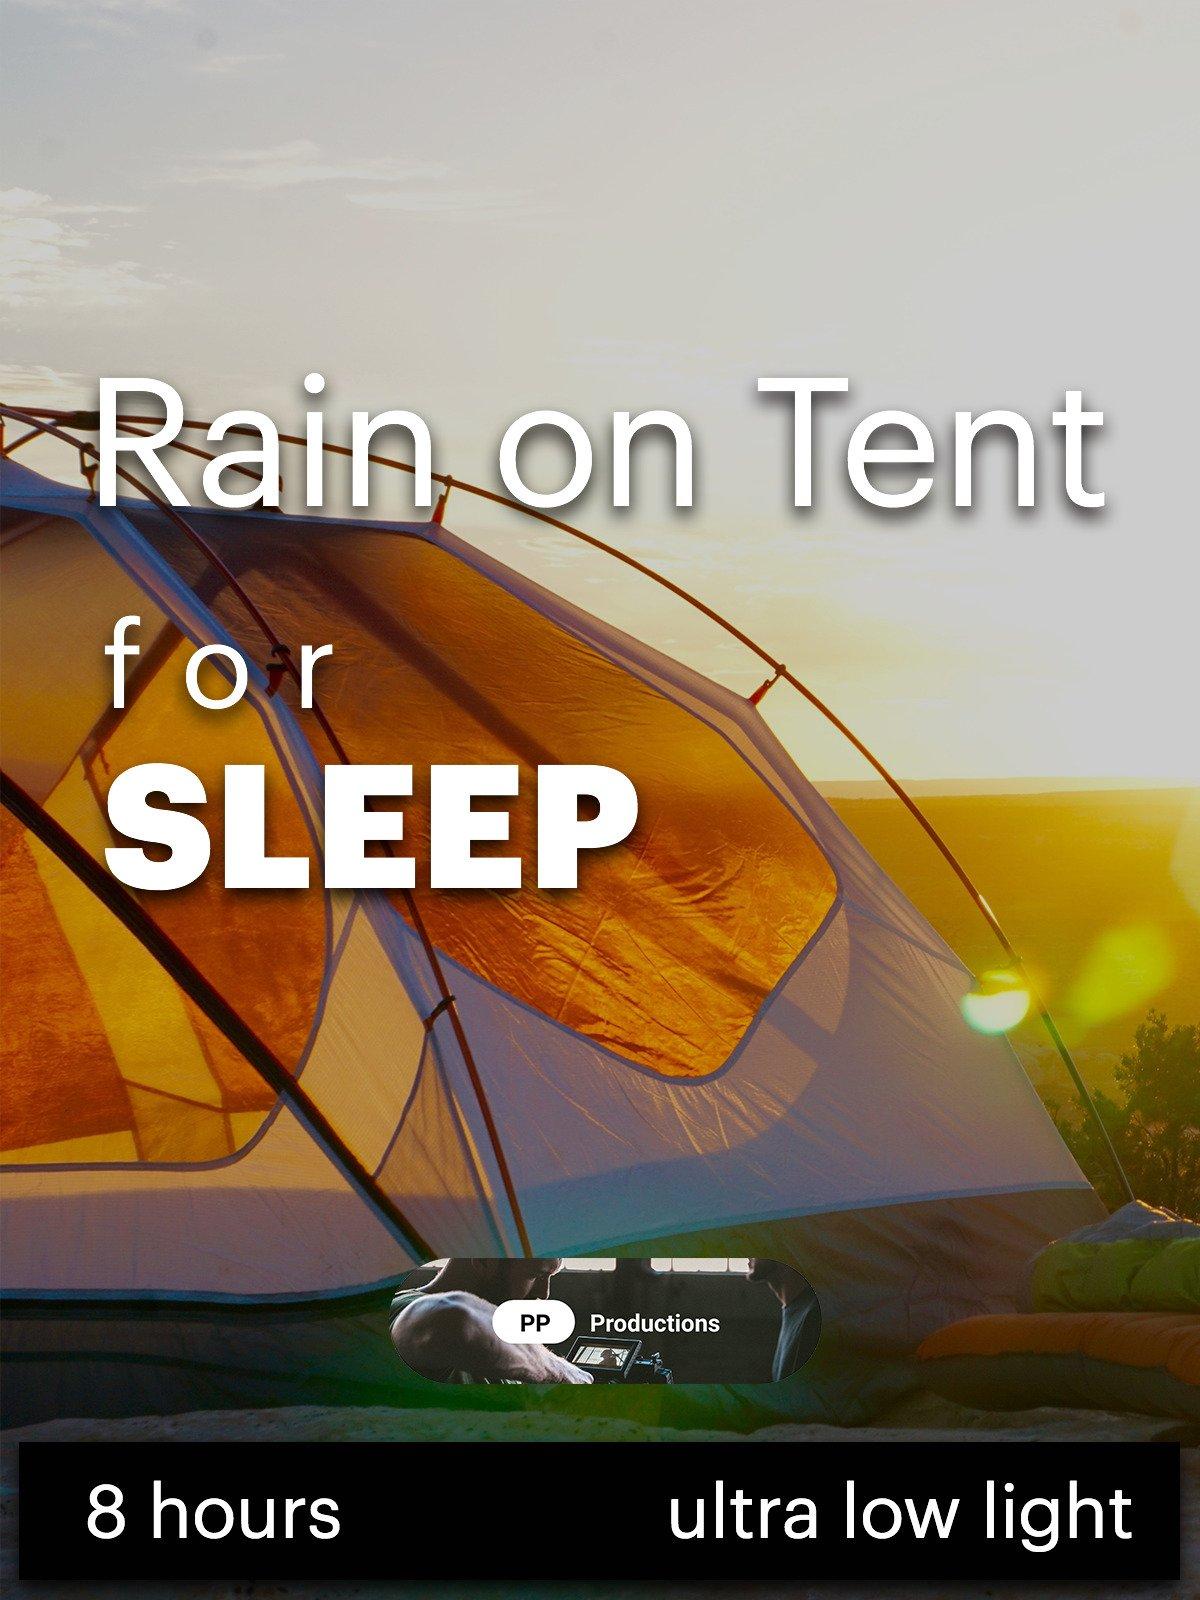 Rain on Tent 8 hours for sleep